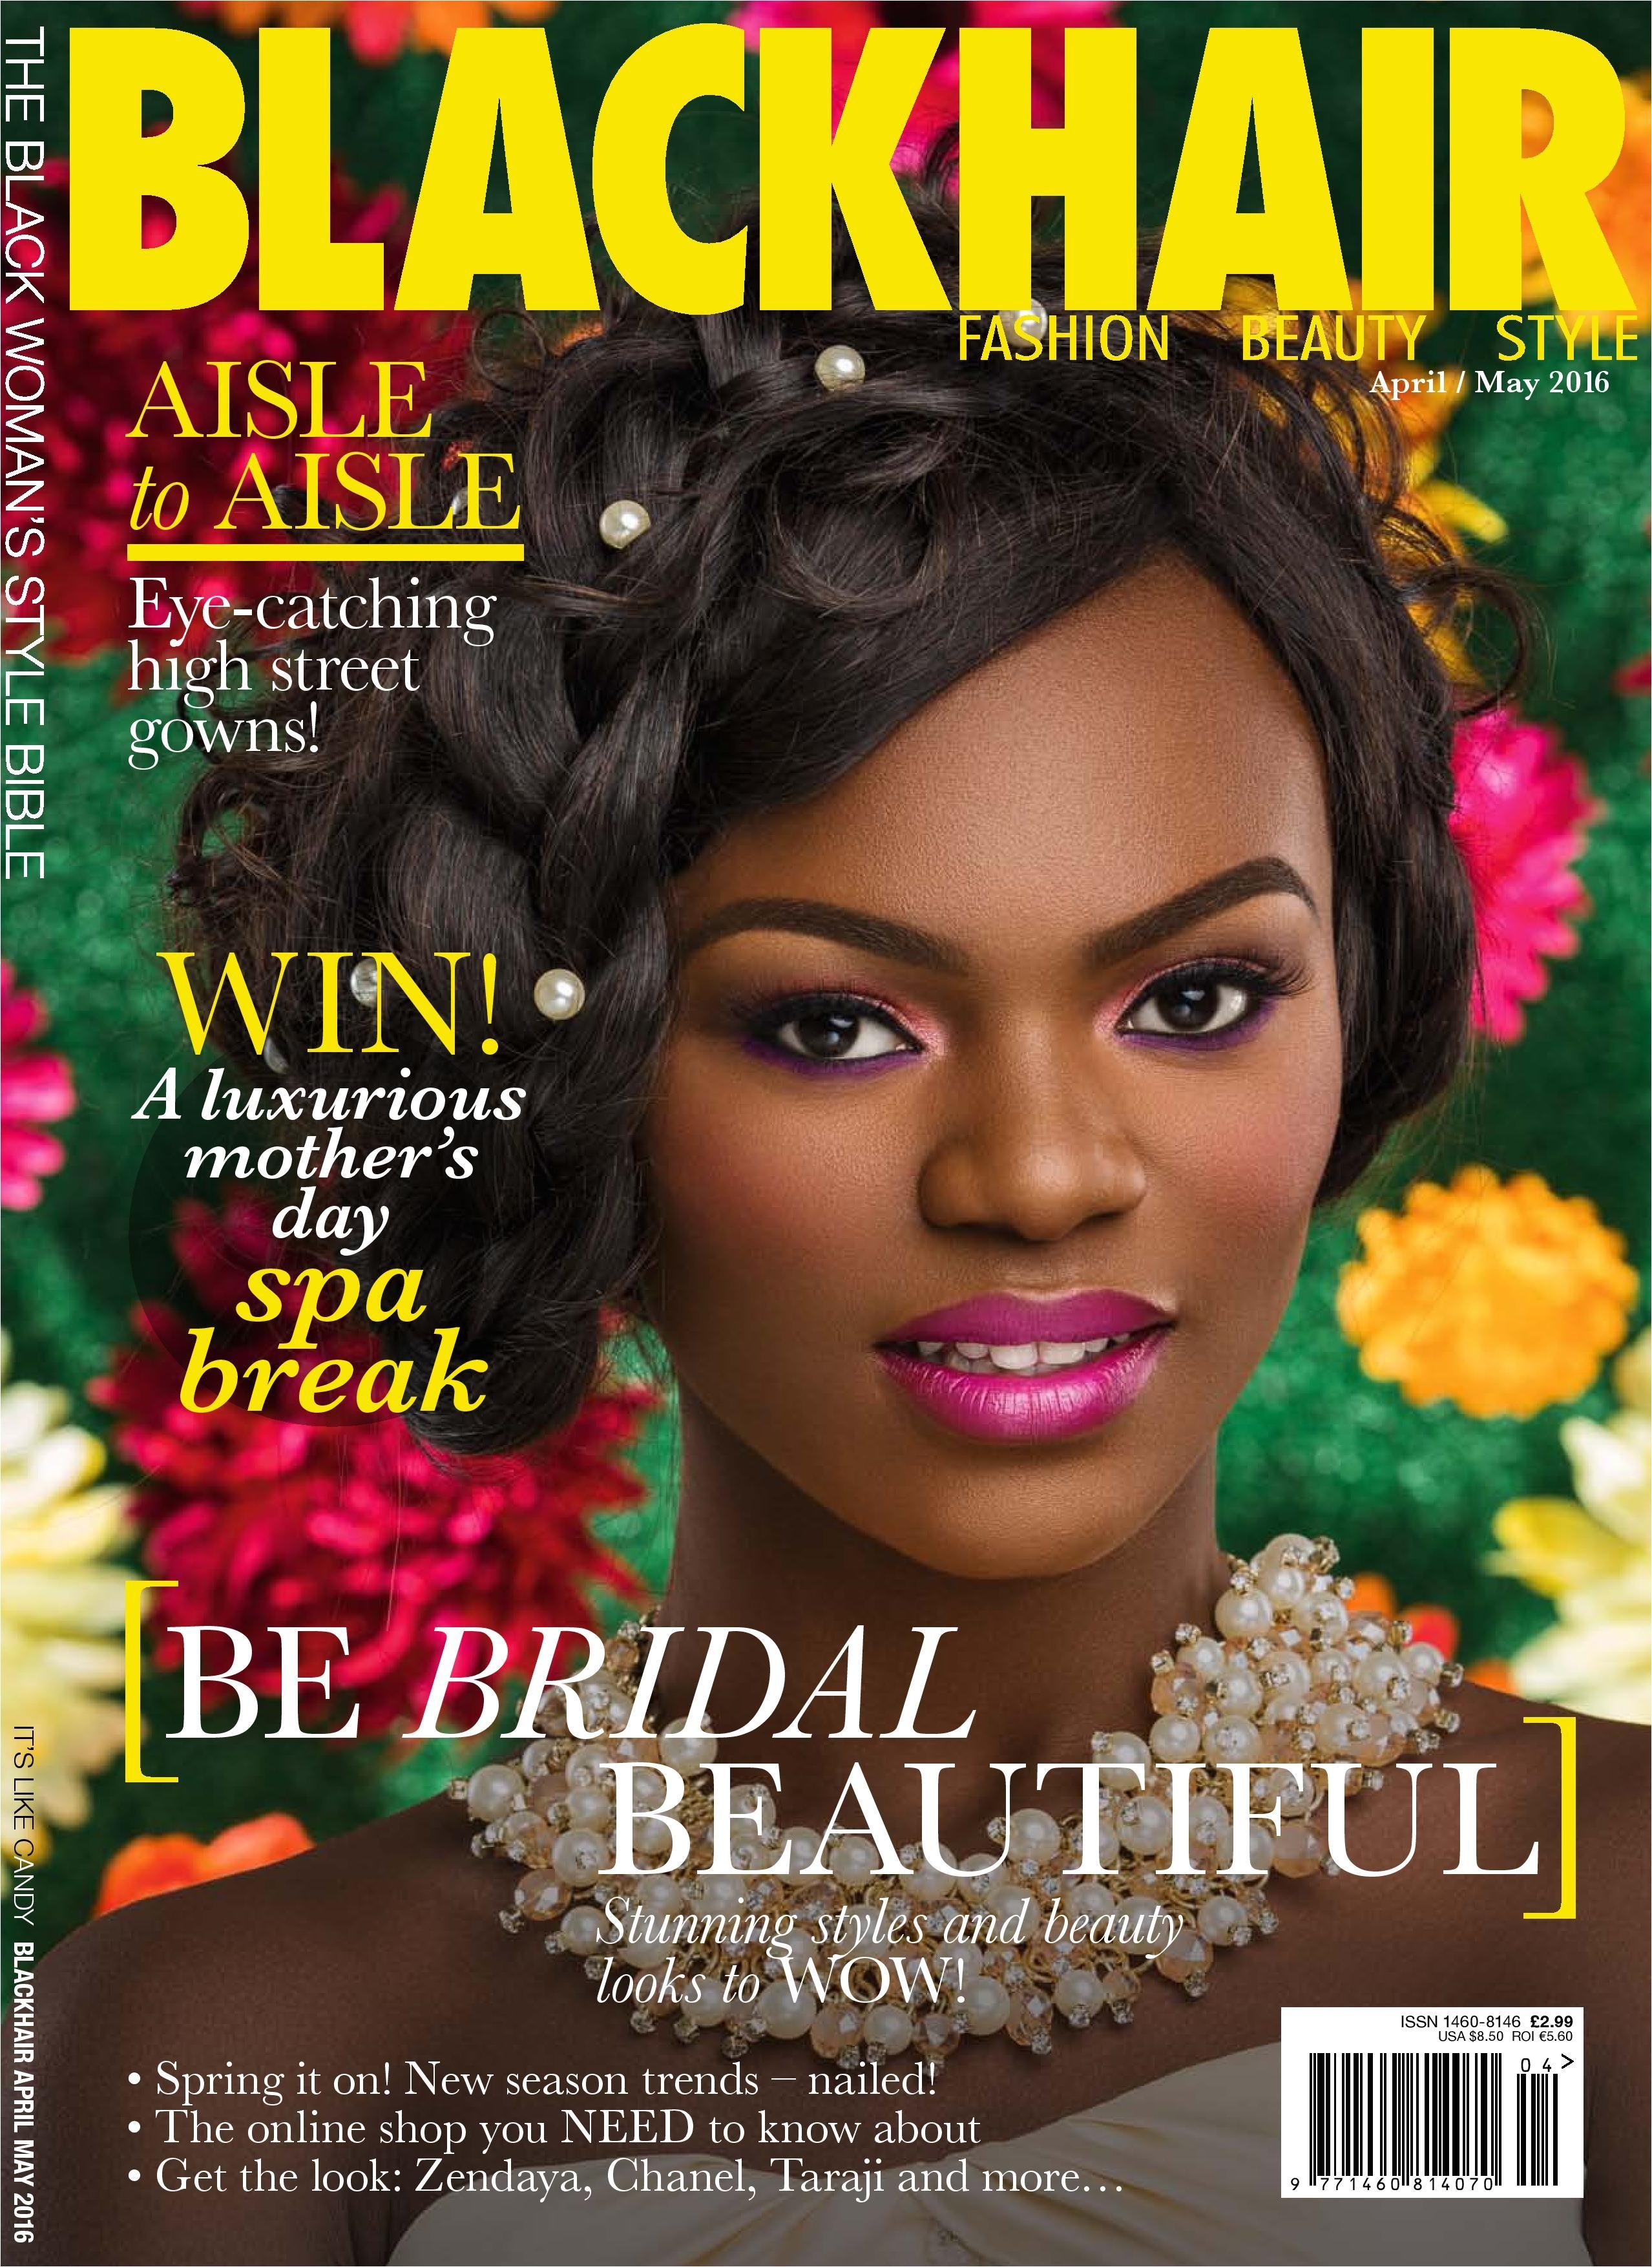 Black Hairstyles Magazines Online Black Hairstyle Magazines Line Hairstyles